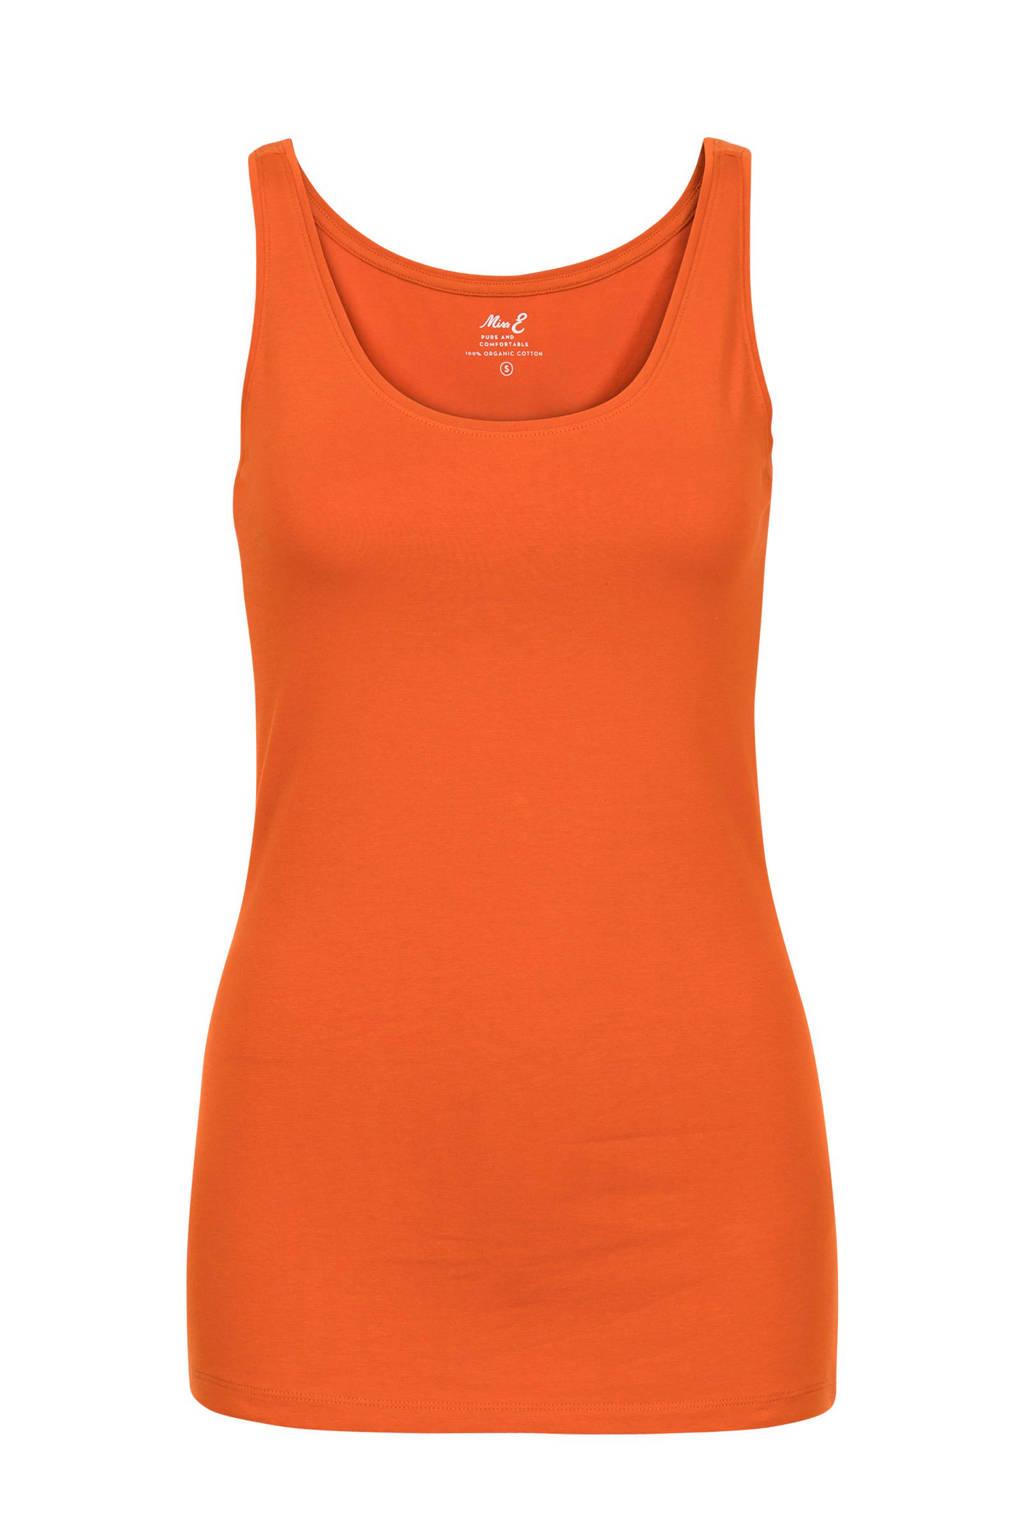 Miss Etam Regulier singlet oranje, Oranje